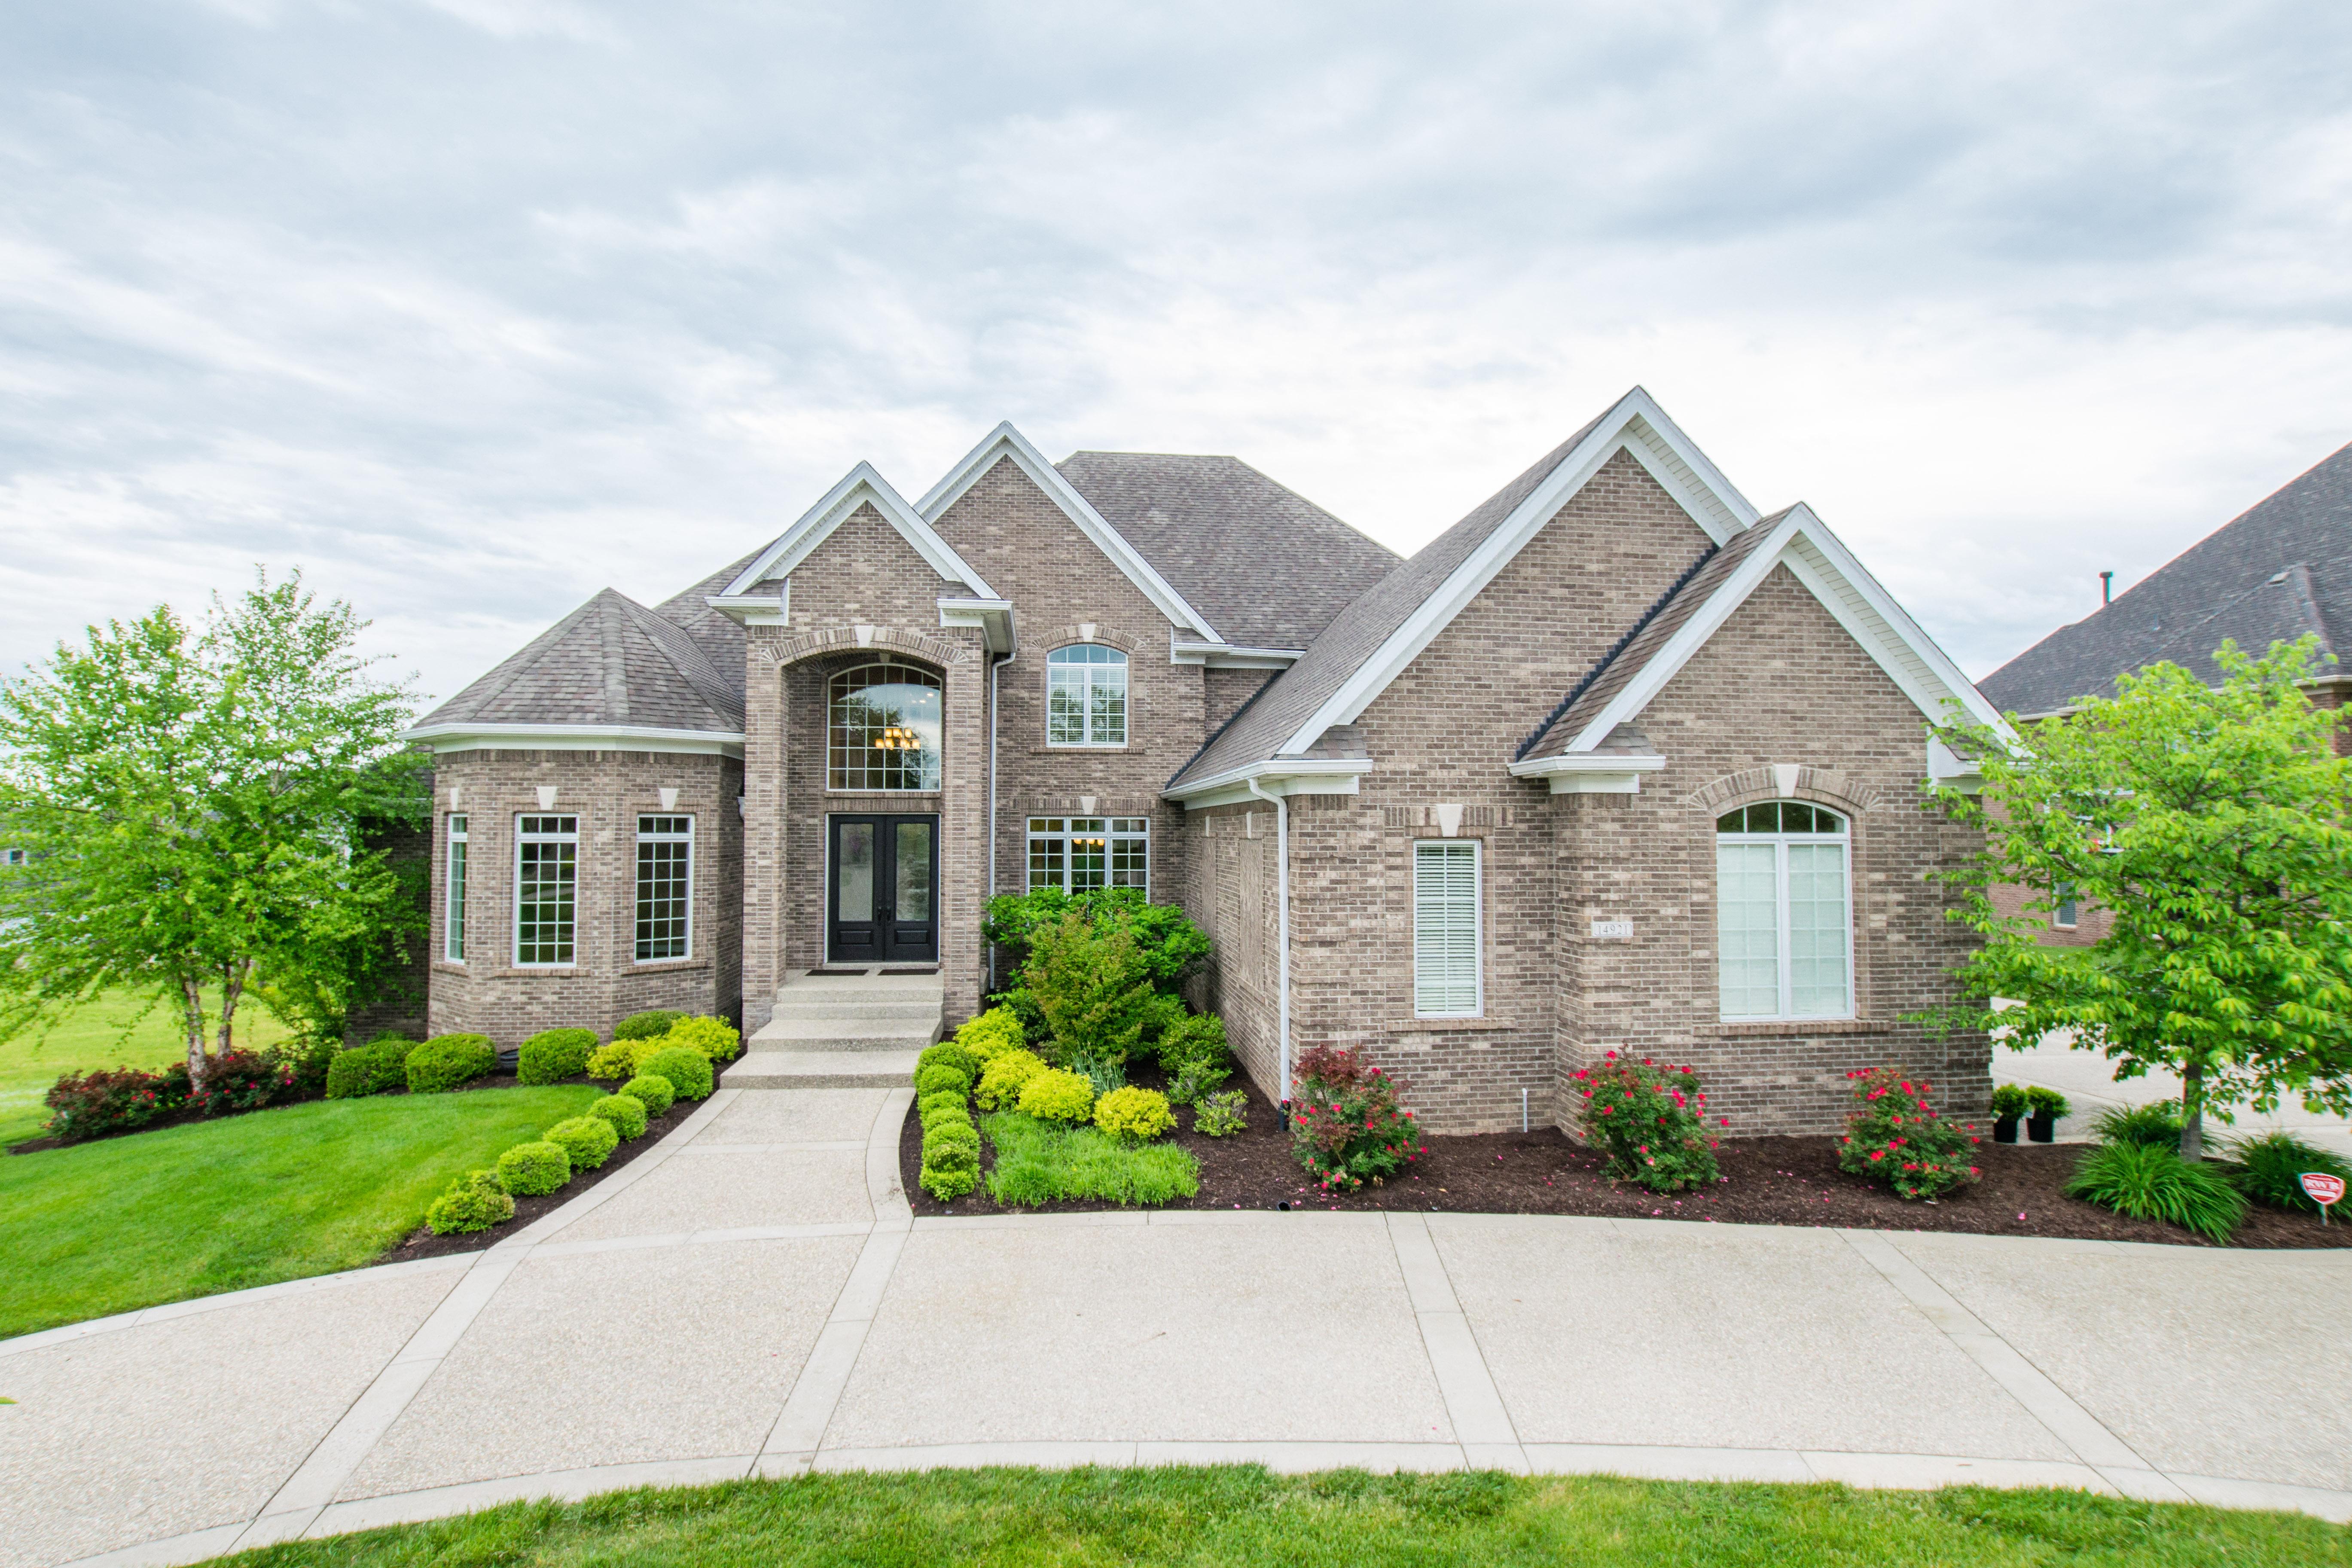 open-houses property at 14921 Landmark Drive